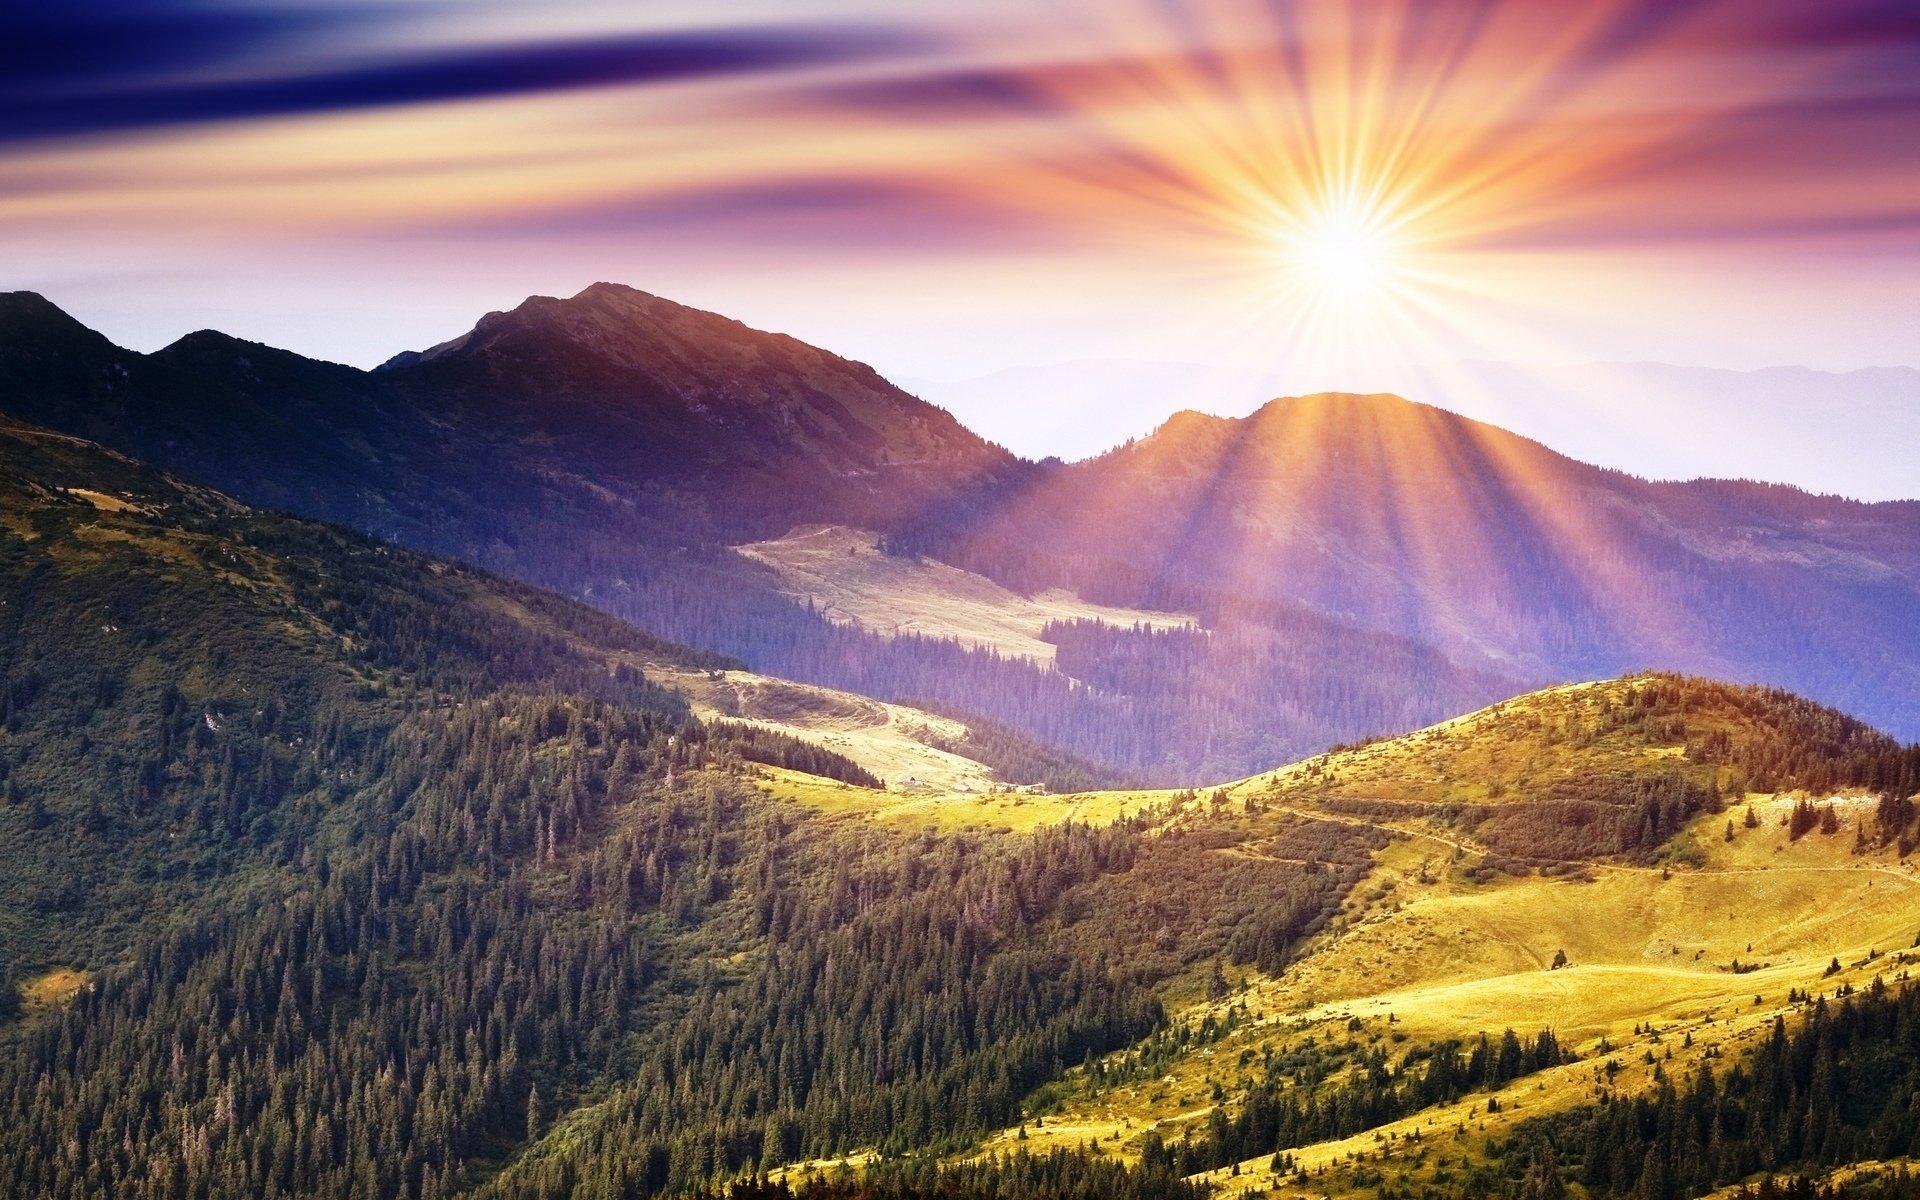 Earth - Sunrise  Sun Forest Mountain Cloud Landscape Sky Scenic Wallpaper